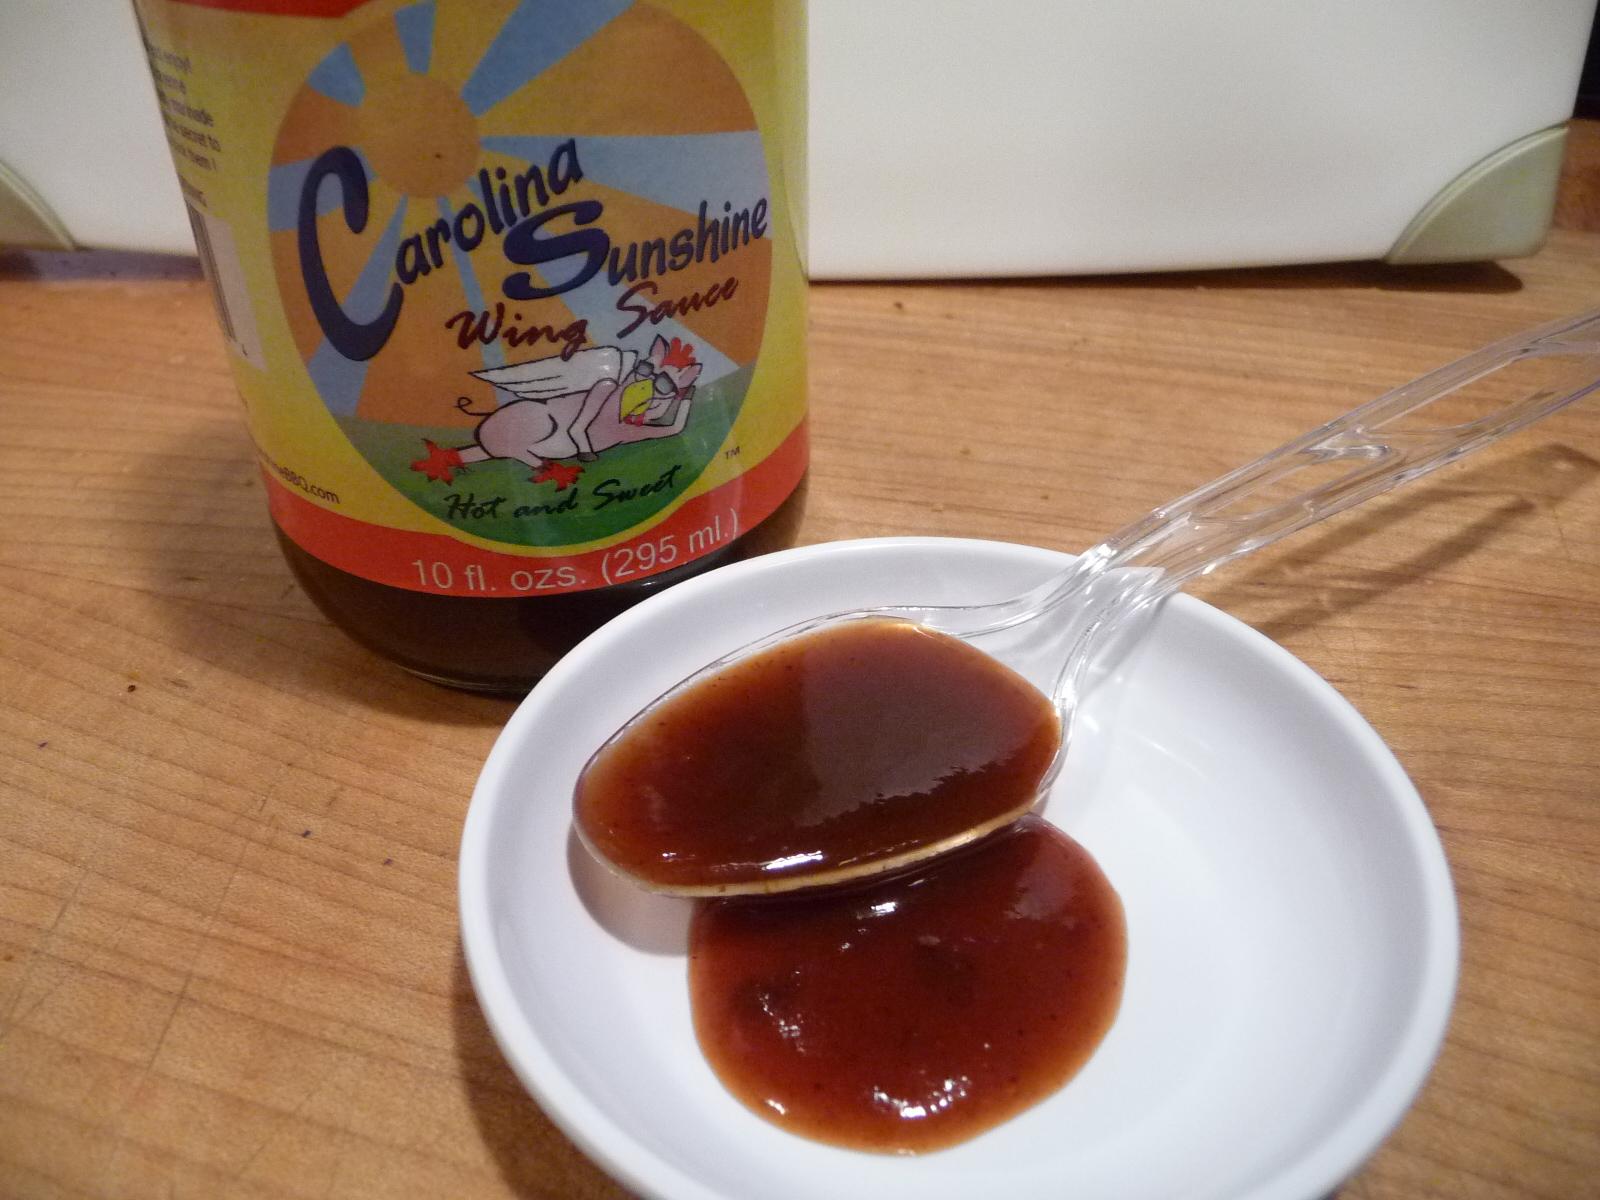 True to Carolina style - big vinegar taste